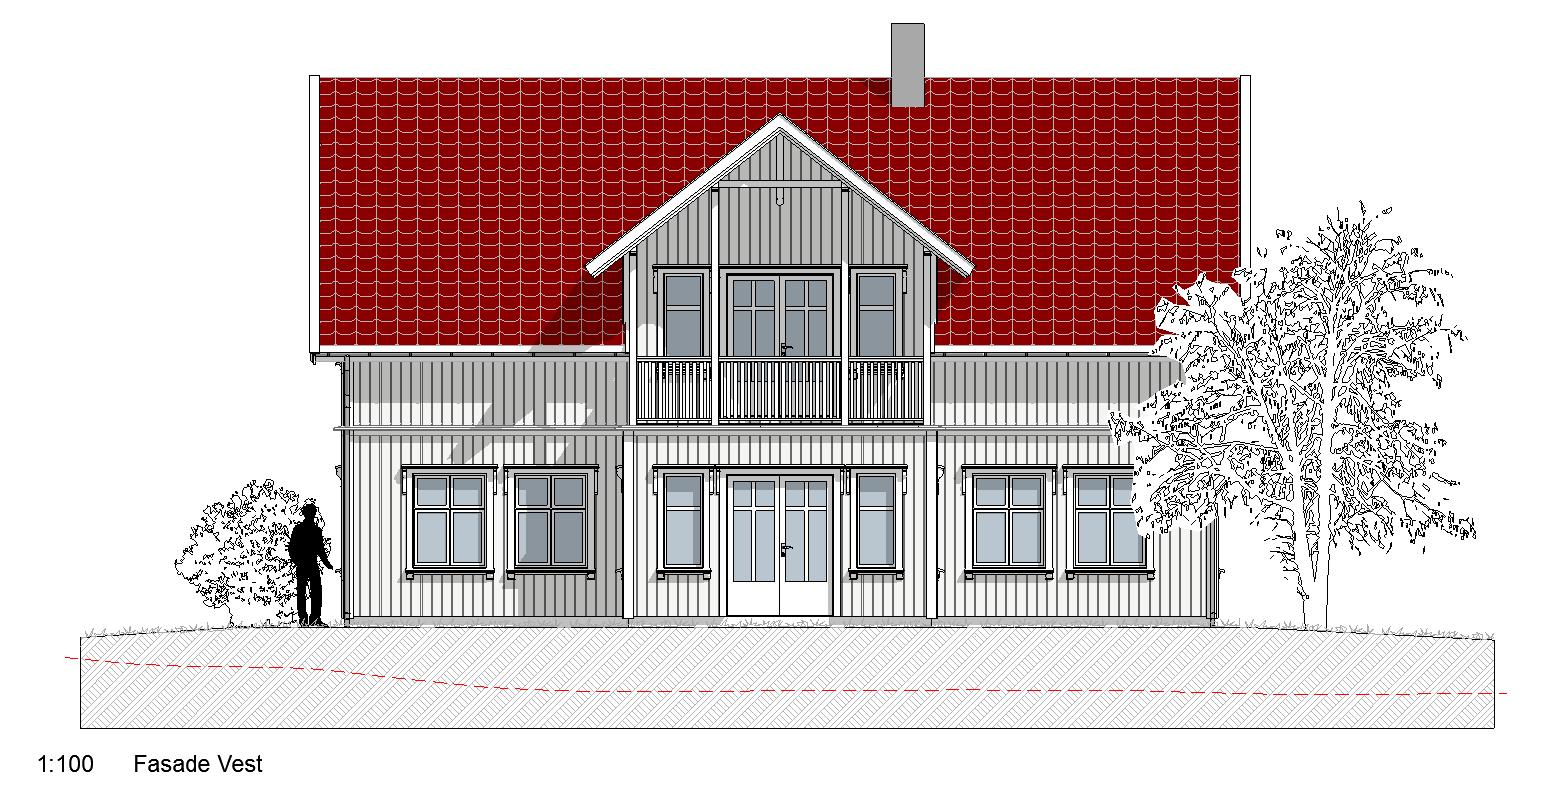 bolig fasad 2